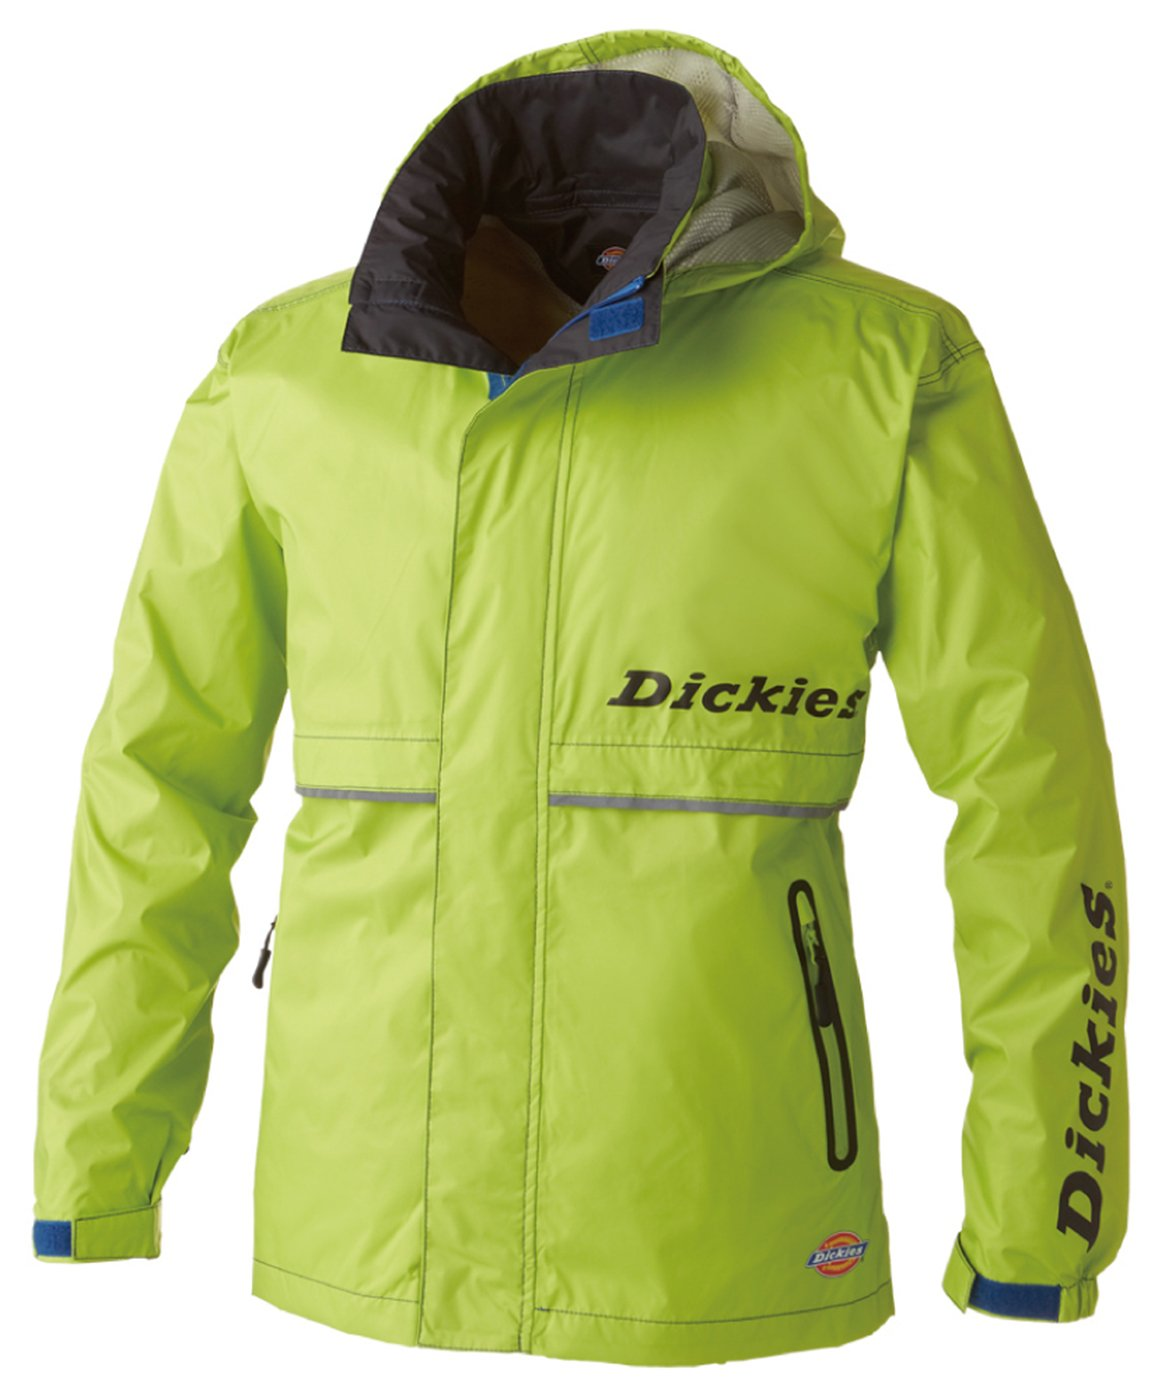 Dickies(ディッキーズ) Dickies レインウェア 上着 合羽 メンズ cc-d3505 B078TZVVPV M|ライム ライム M